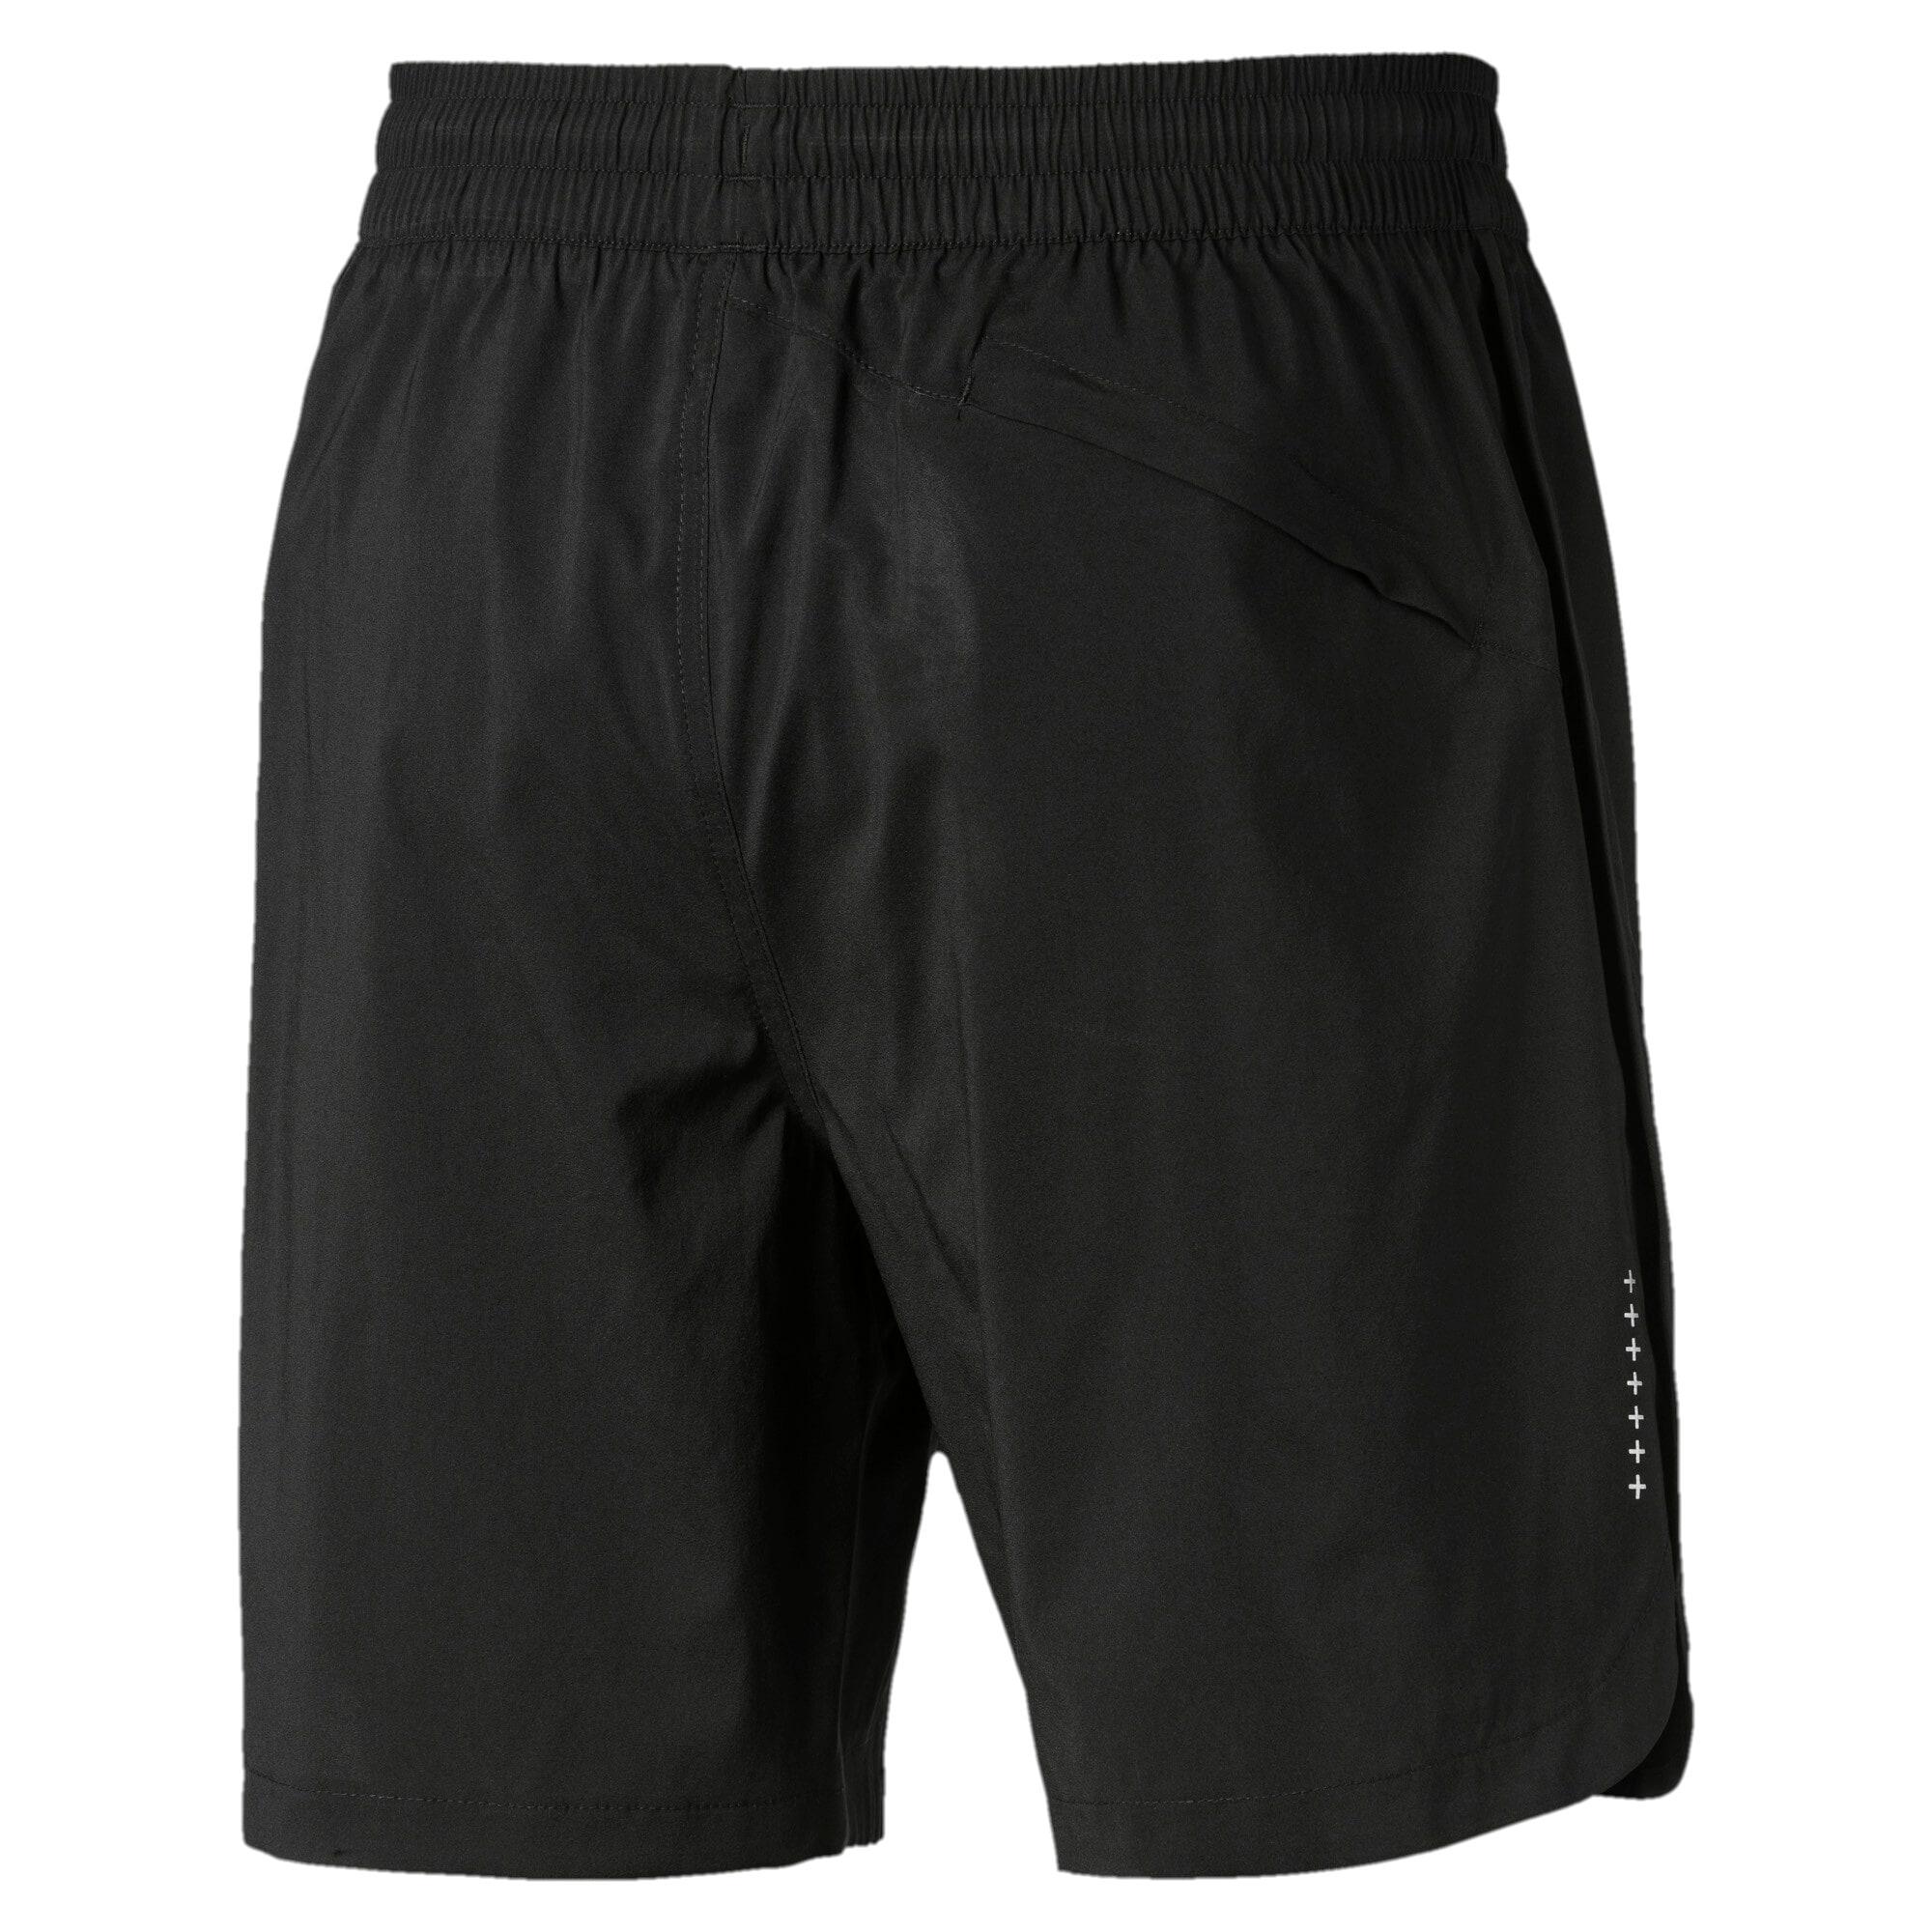 Thumbnail 5 of Last Lap Woven 2 in 1 Men's Running Shorts, Puma Black, medium